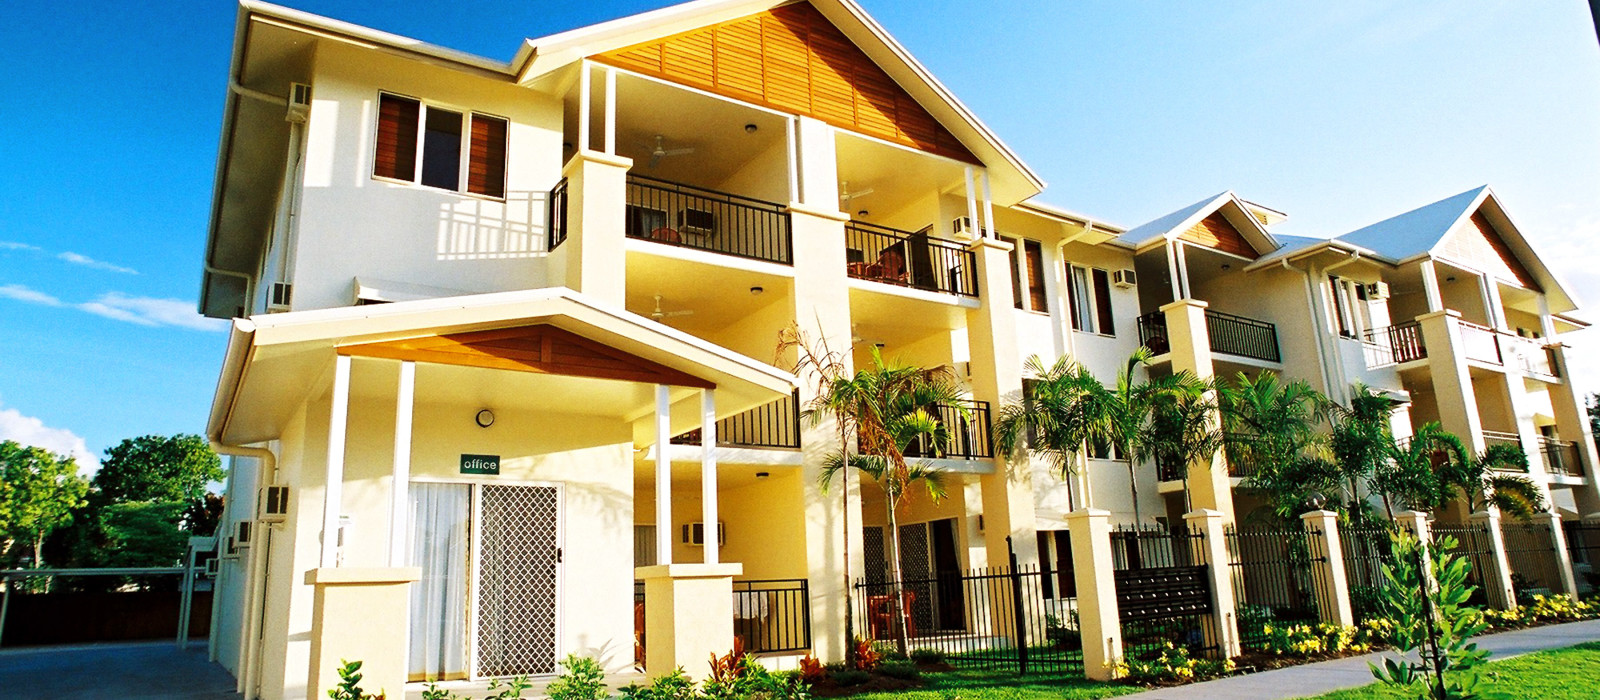 Hotel Bay Village Tropical Retreat Australien